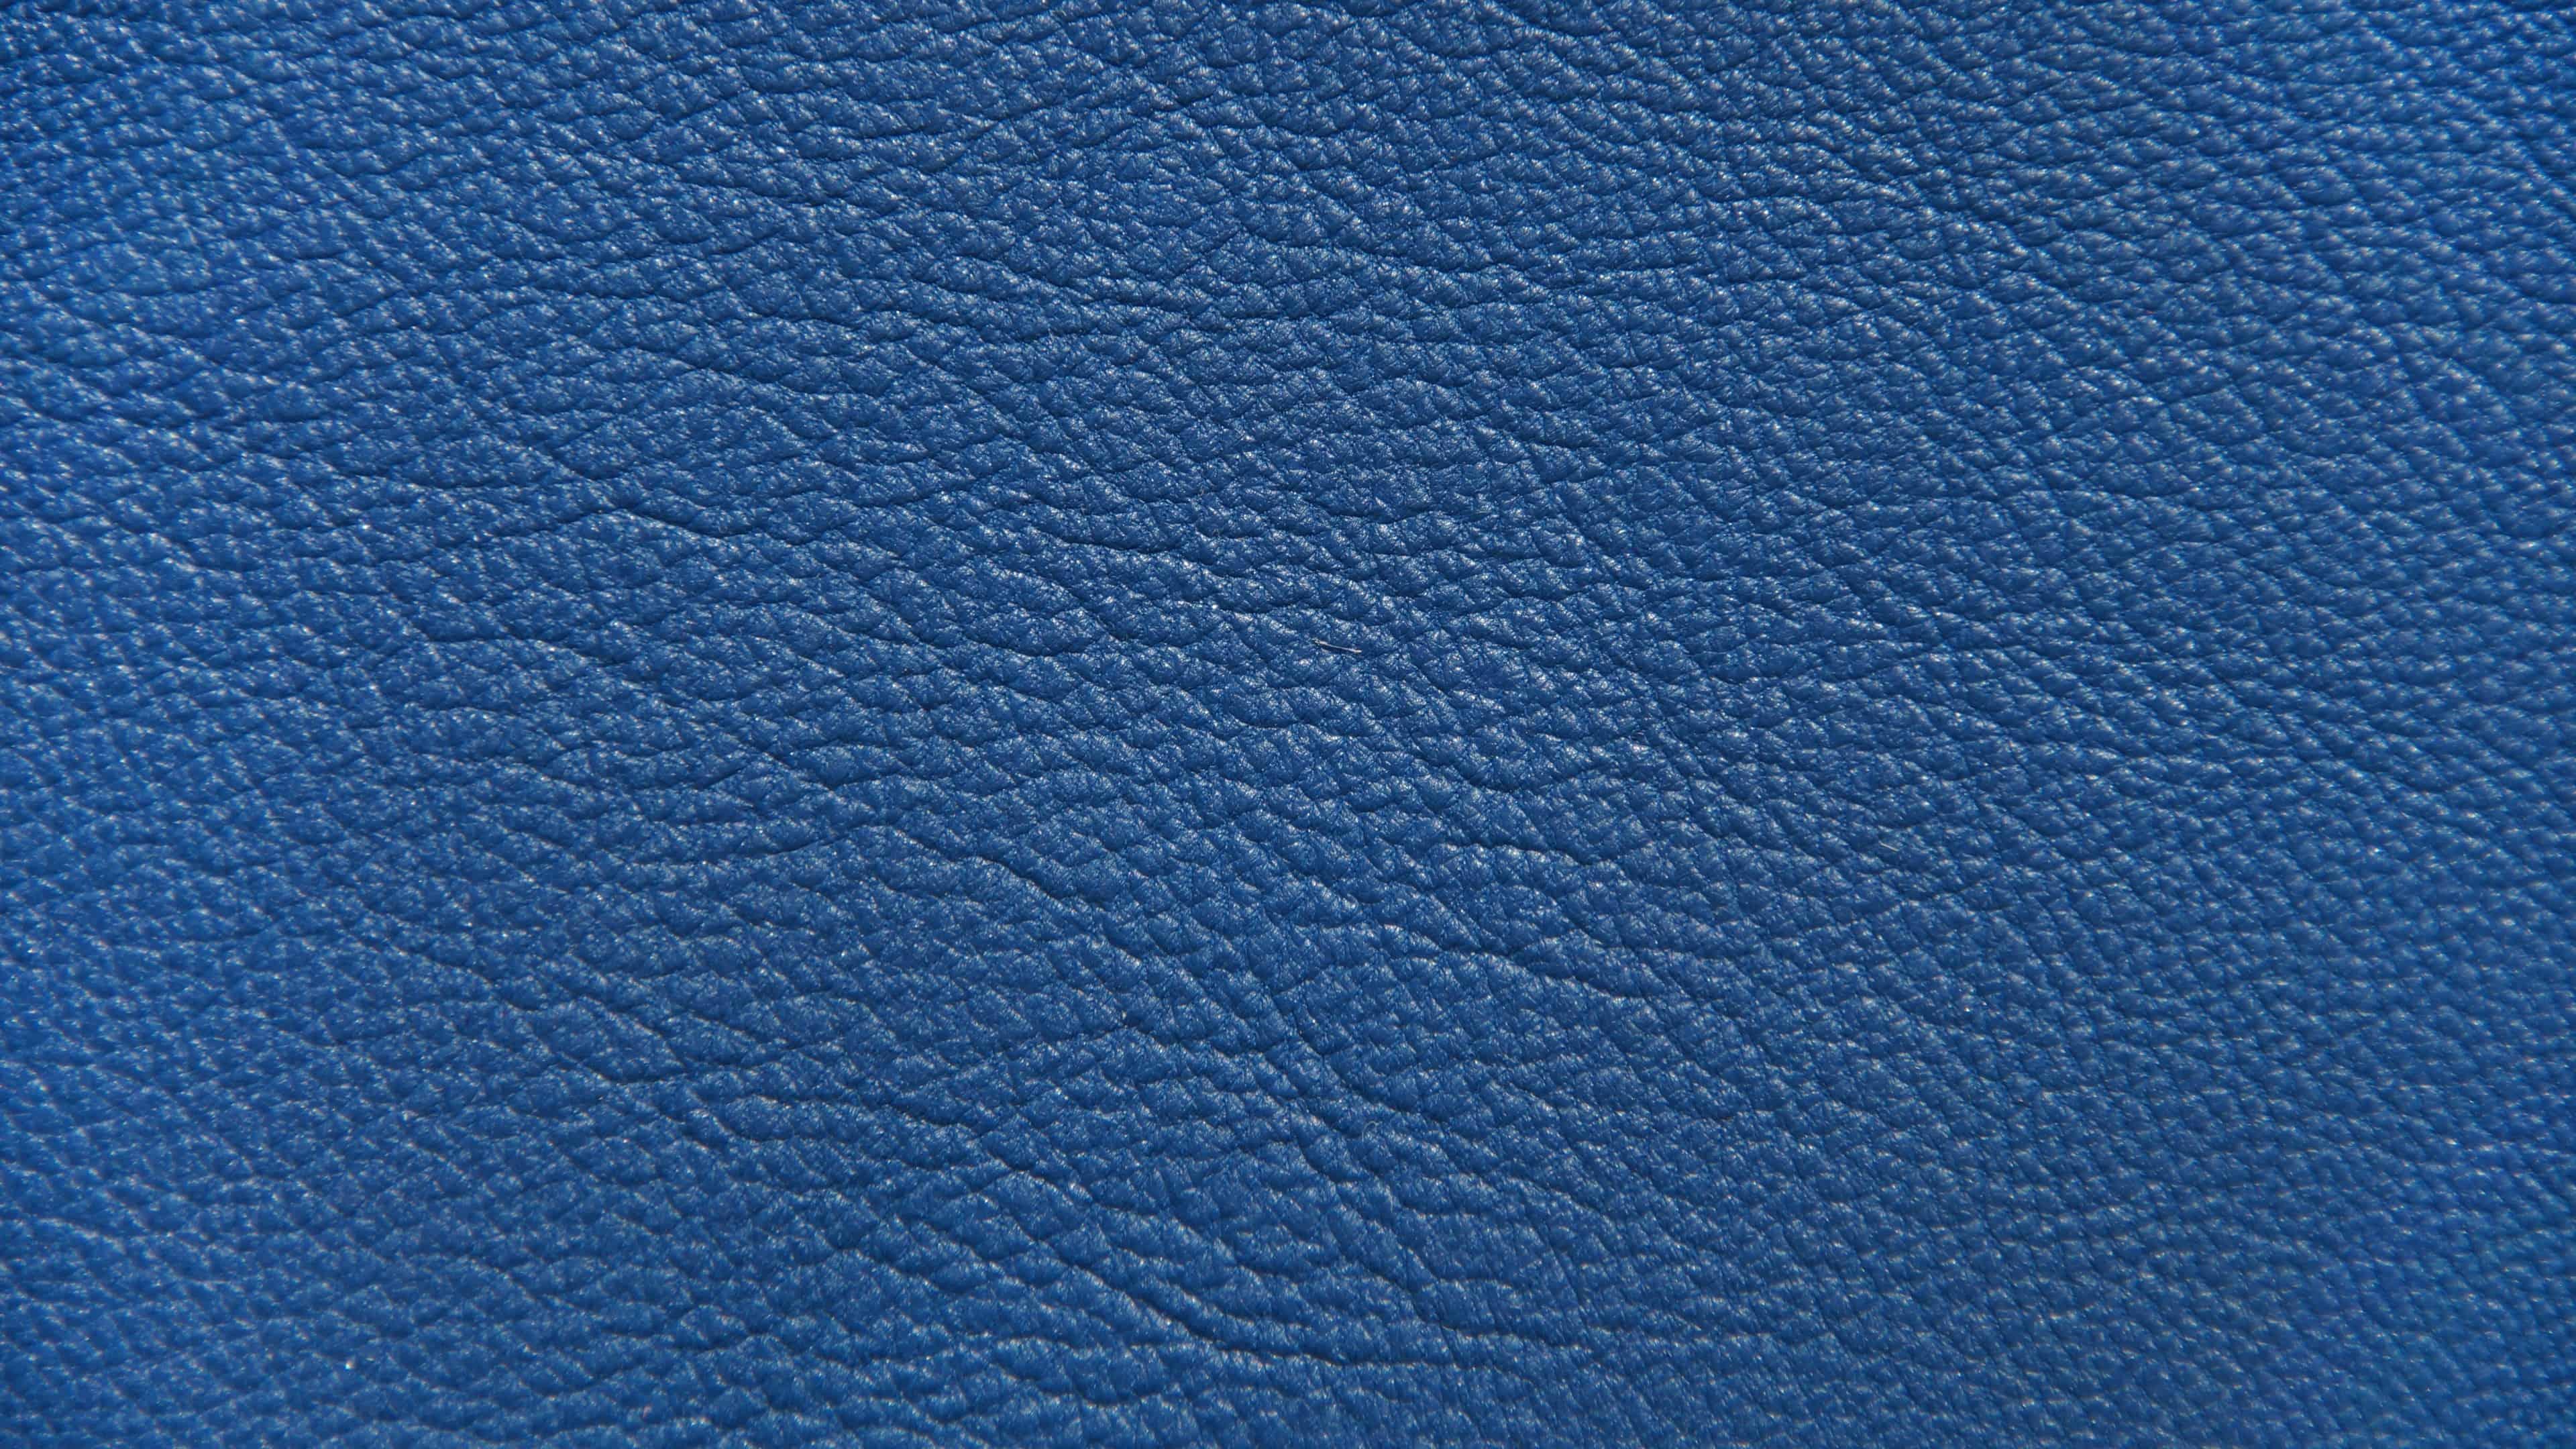 Blue Leather UHD 4K Wallpaper   Pixelz